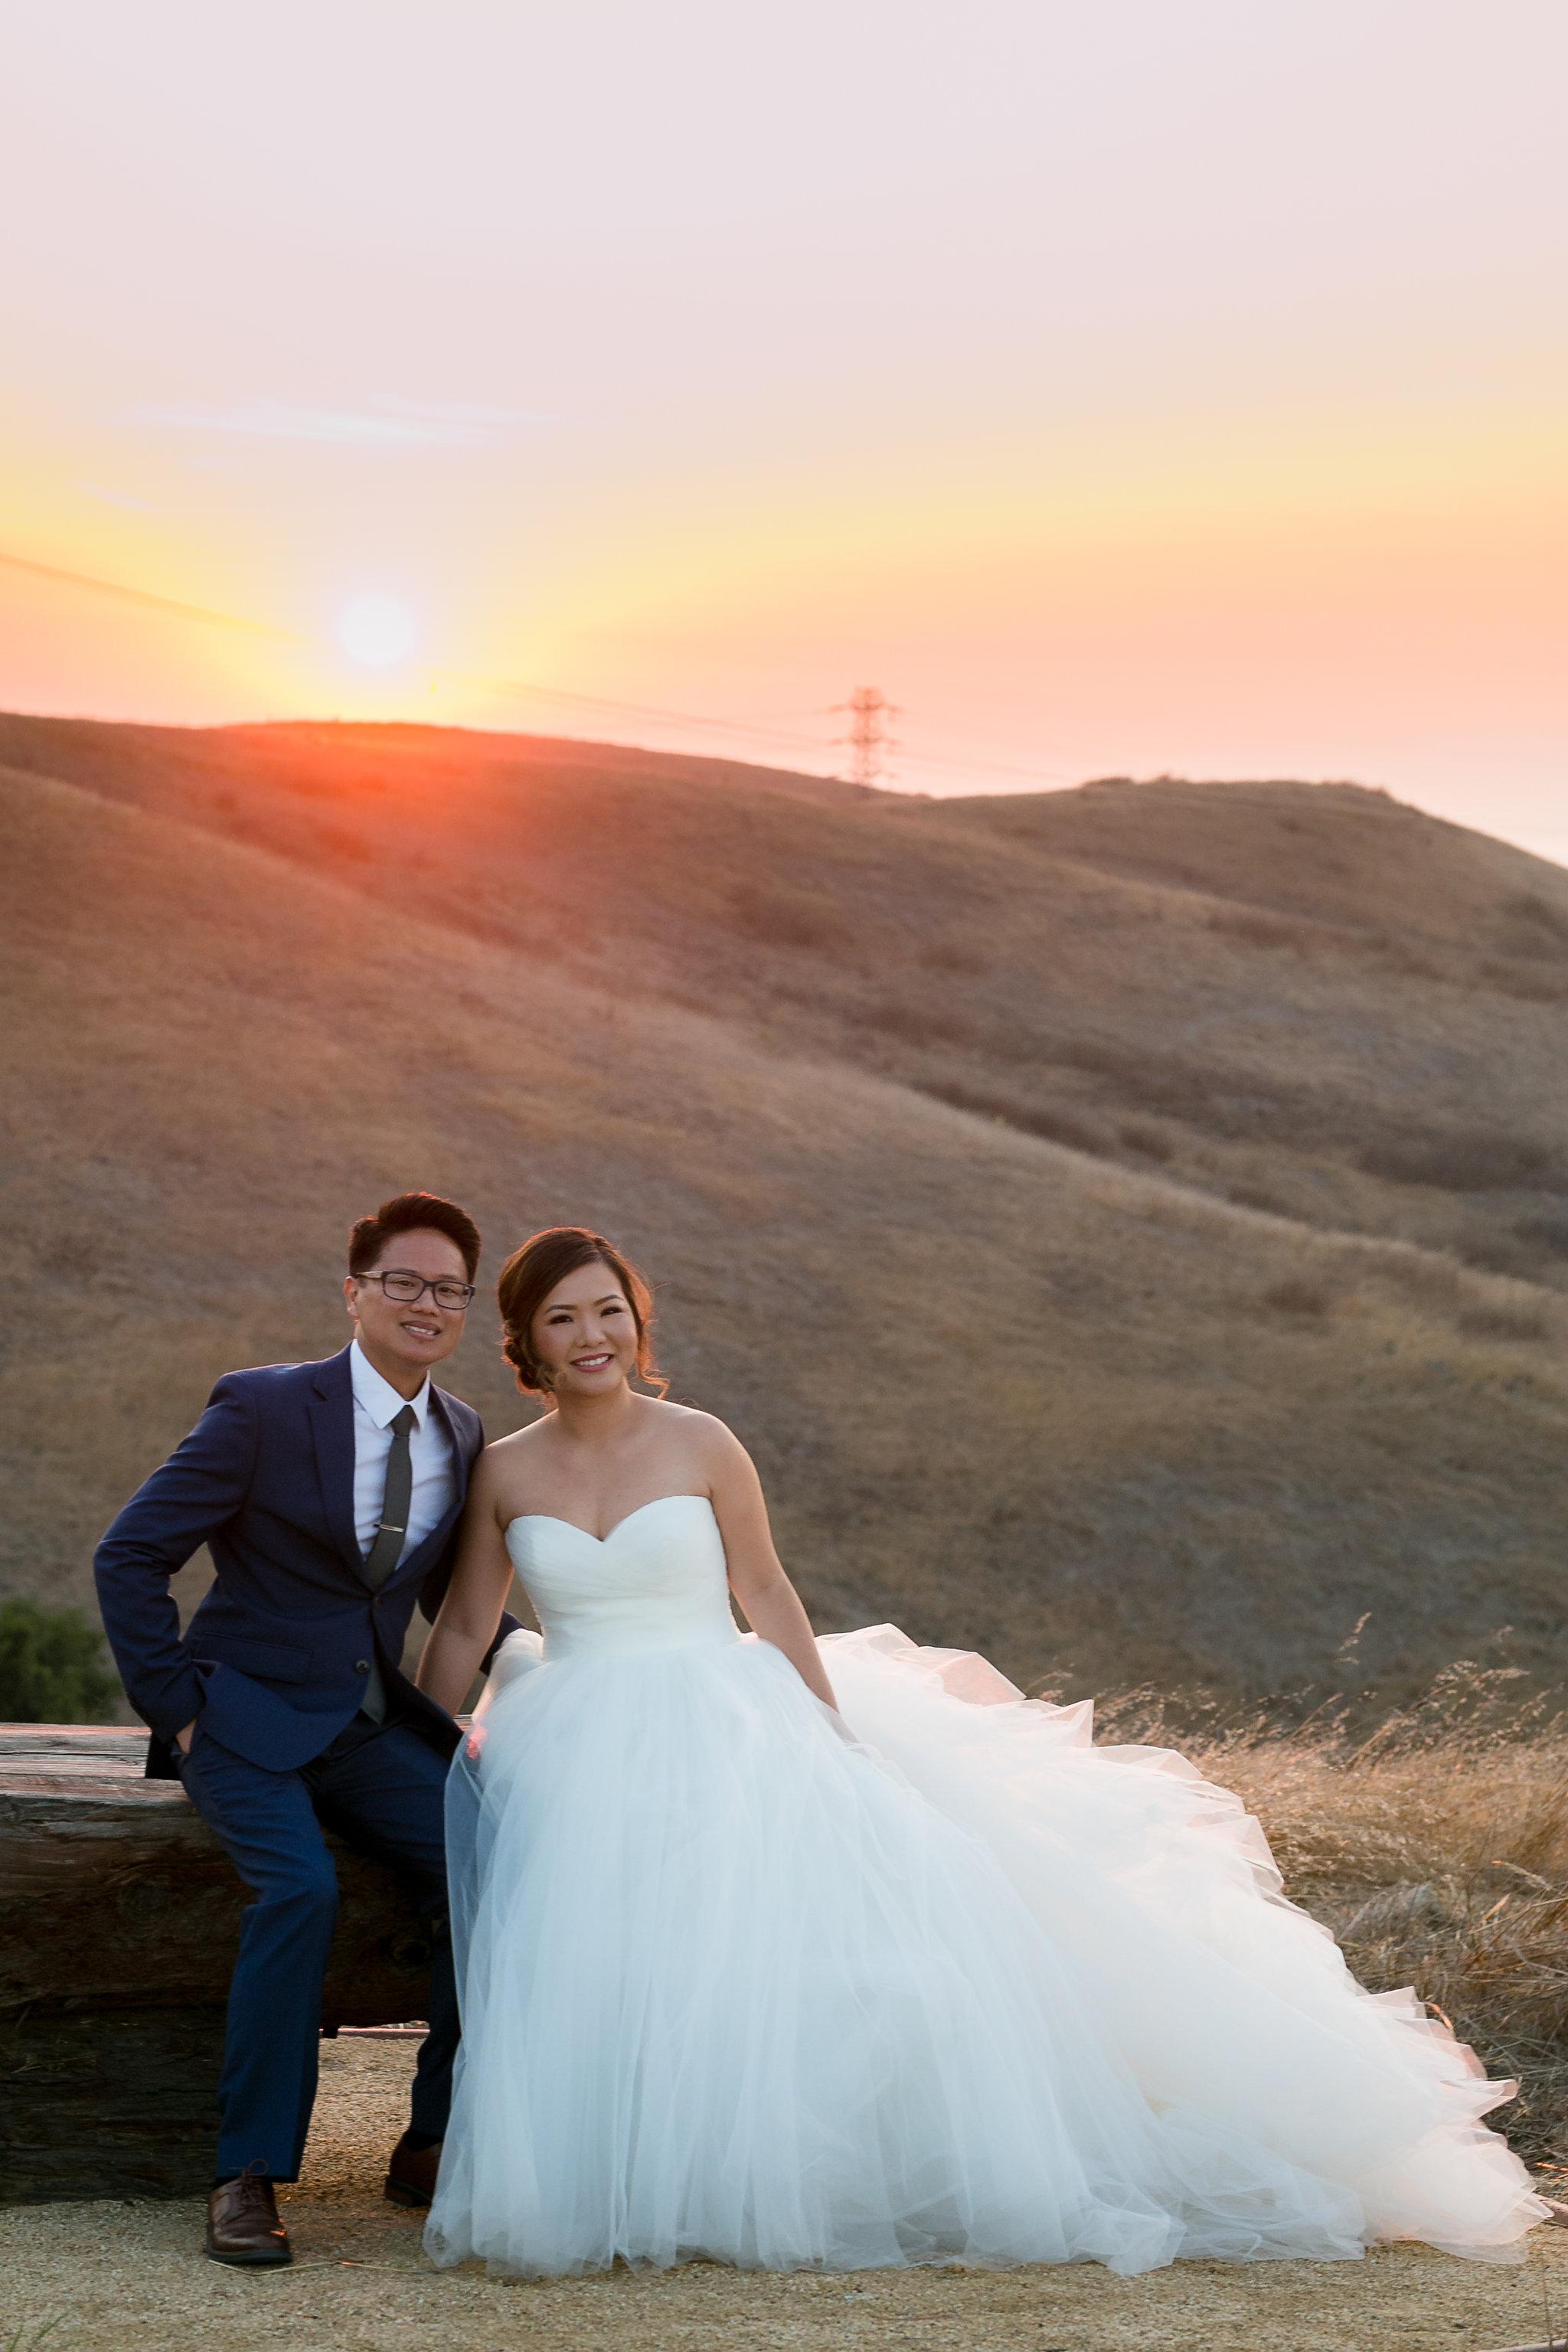 Nella Terra Sunol wedding photography sunset-15.jpg